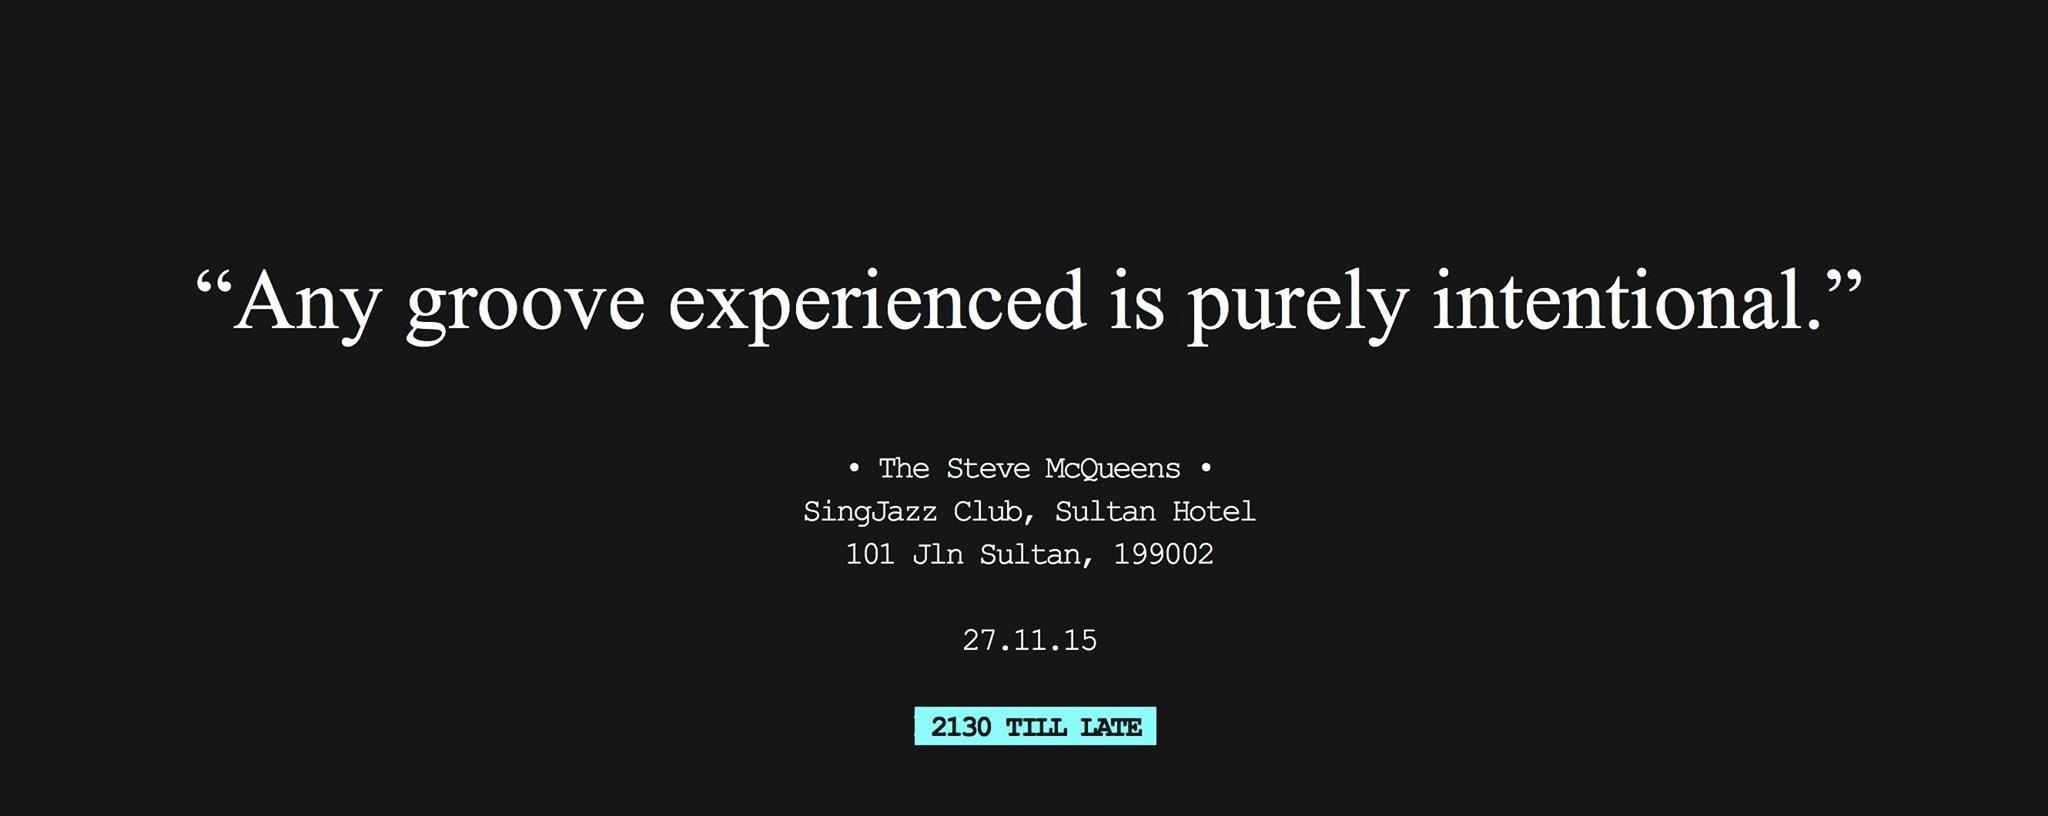 SMQ @ SingJazz Club